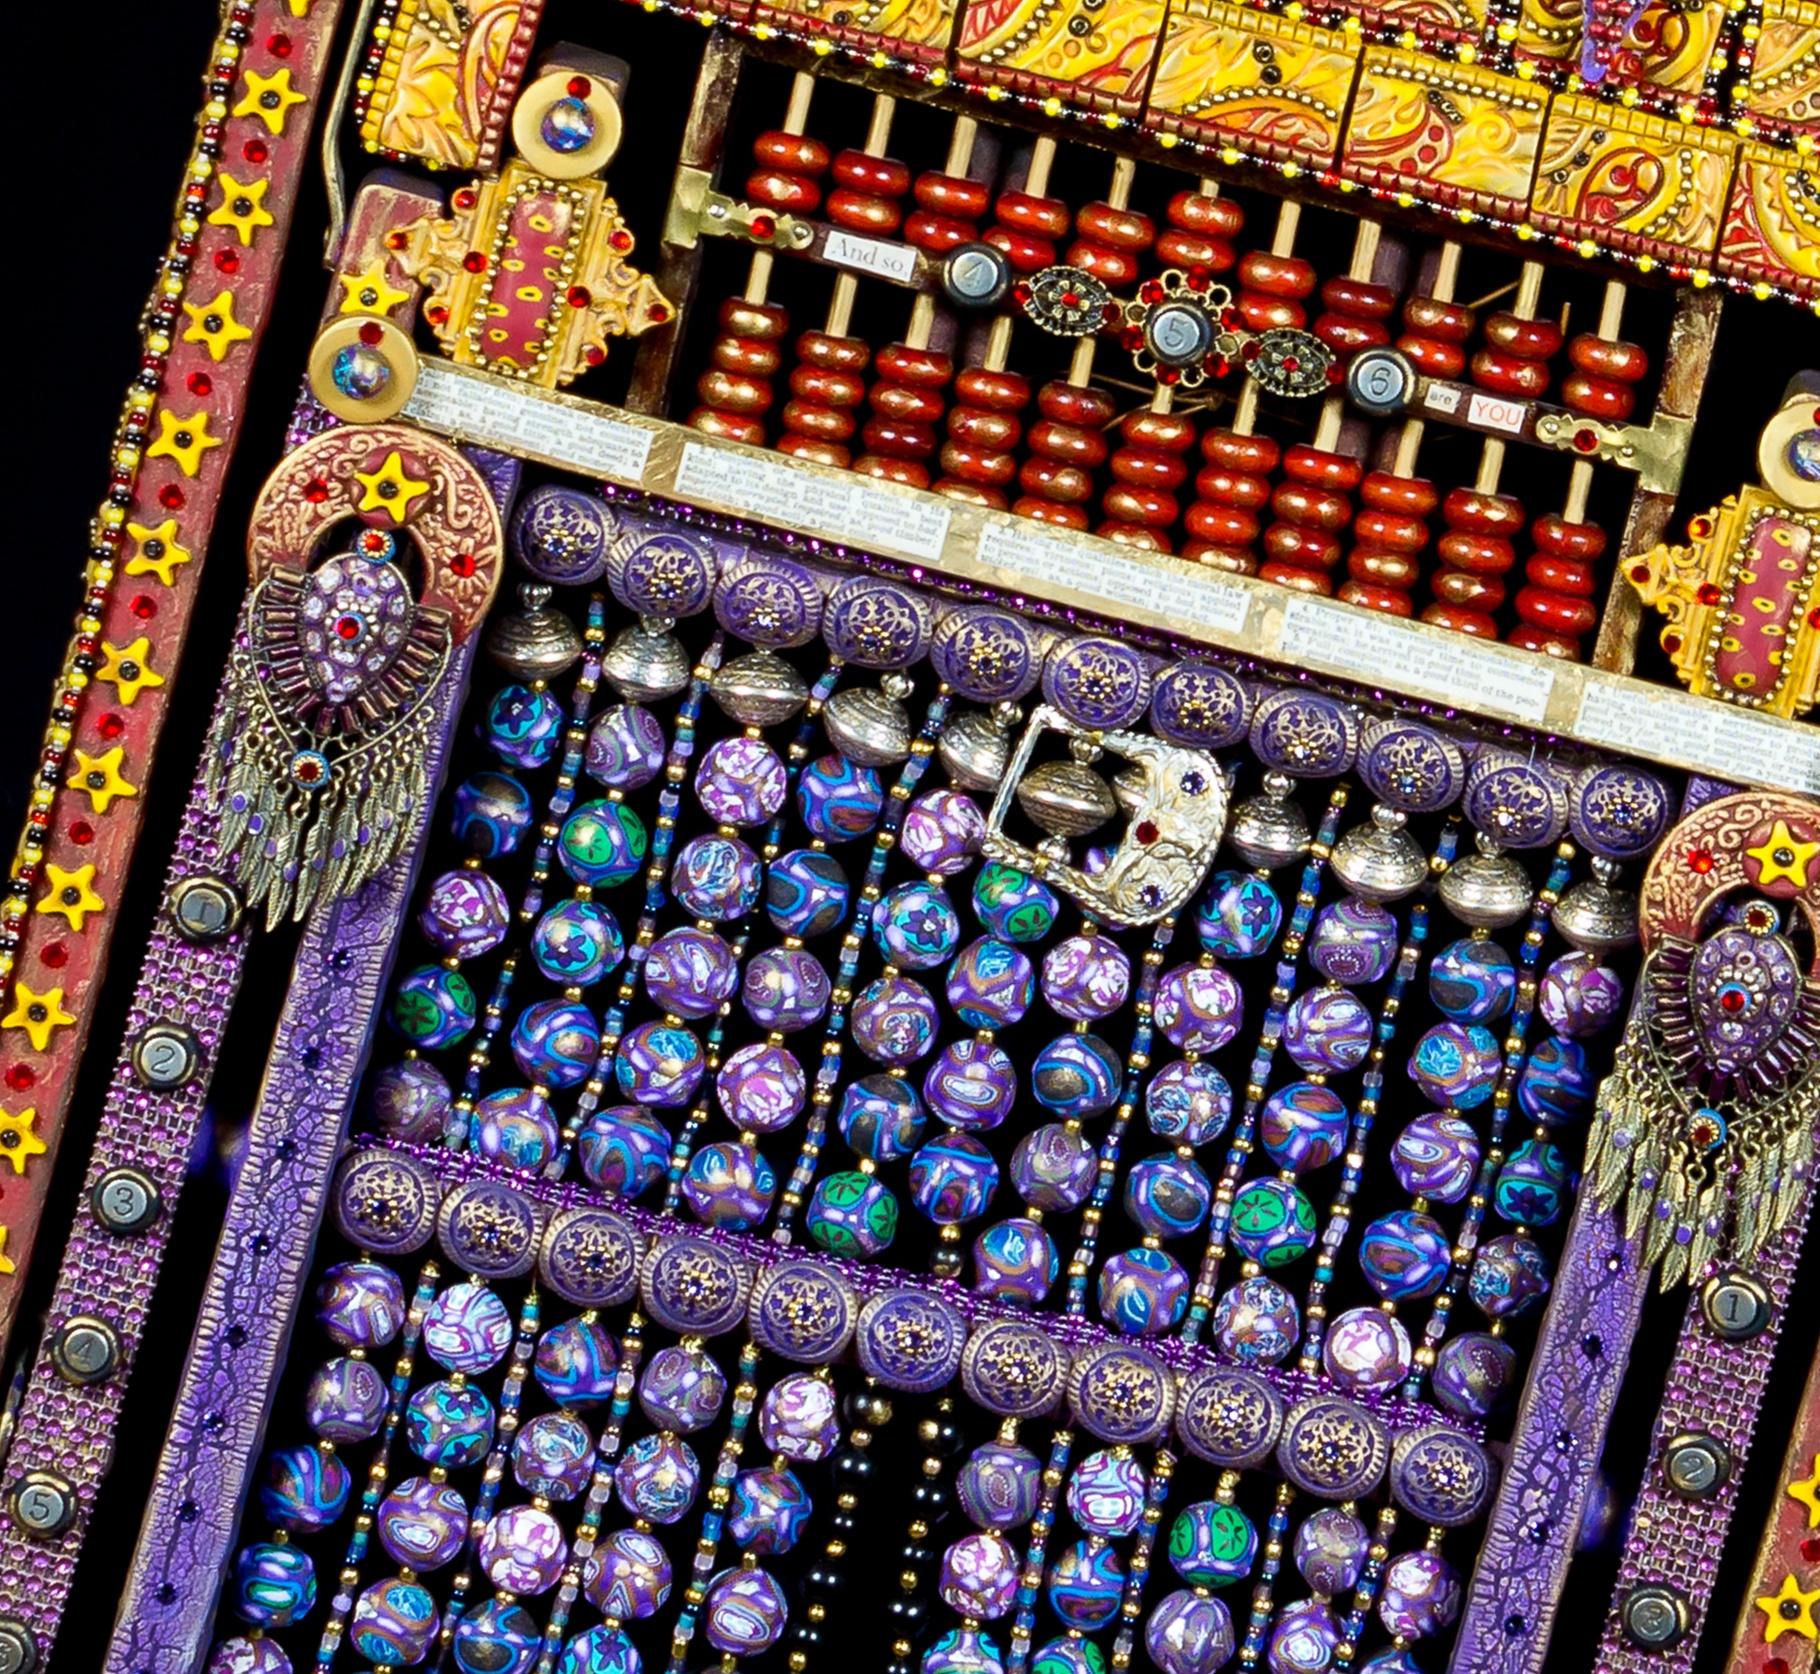 Abacus resize 3.jpg